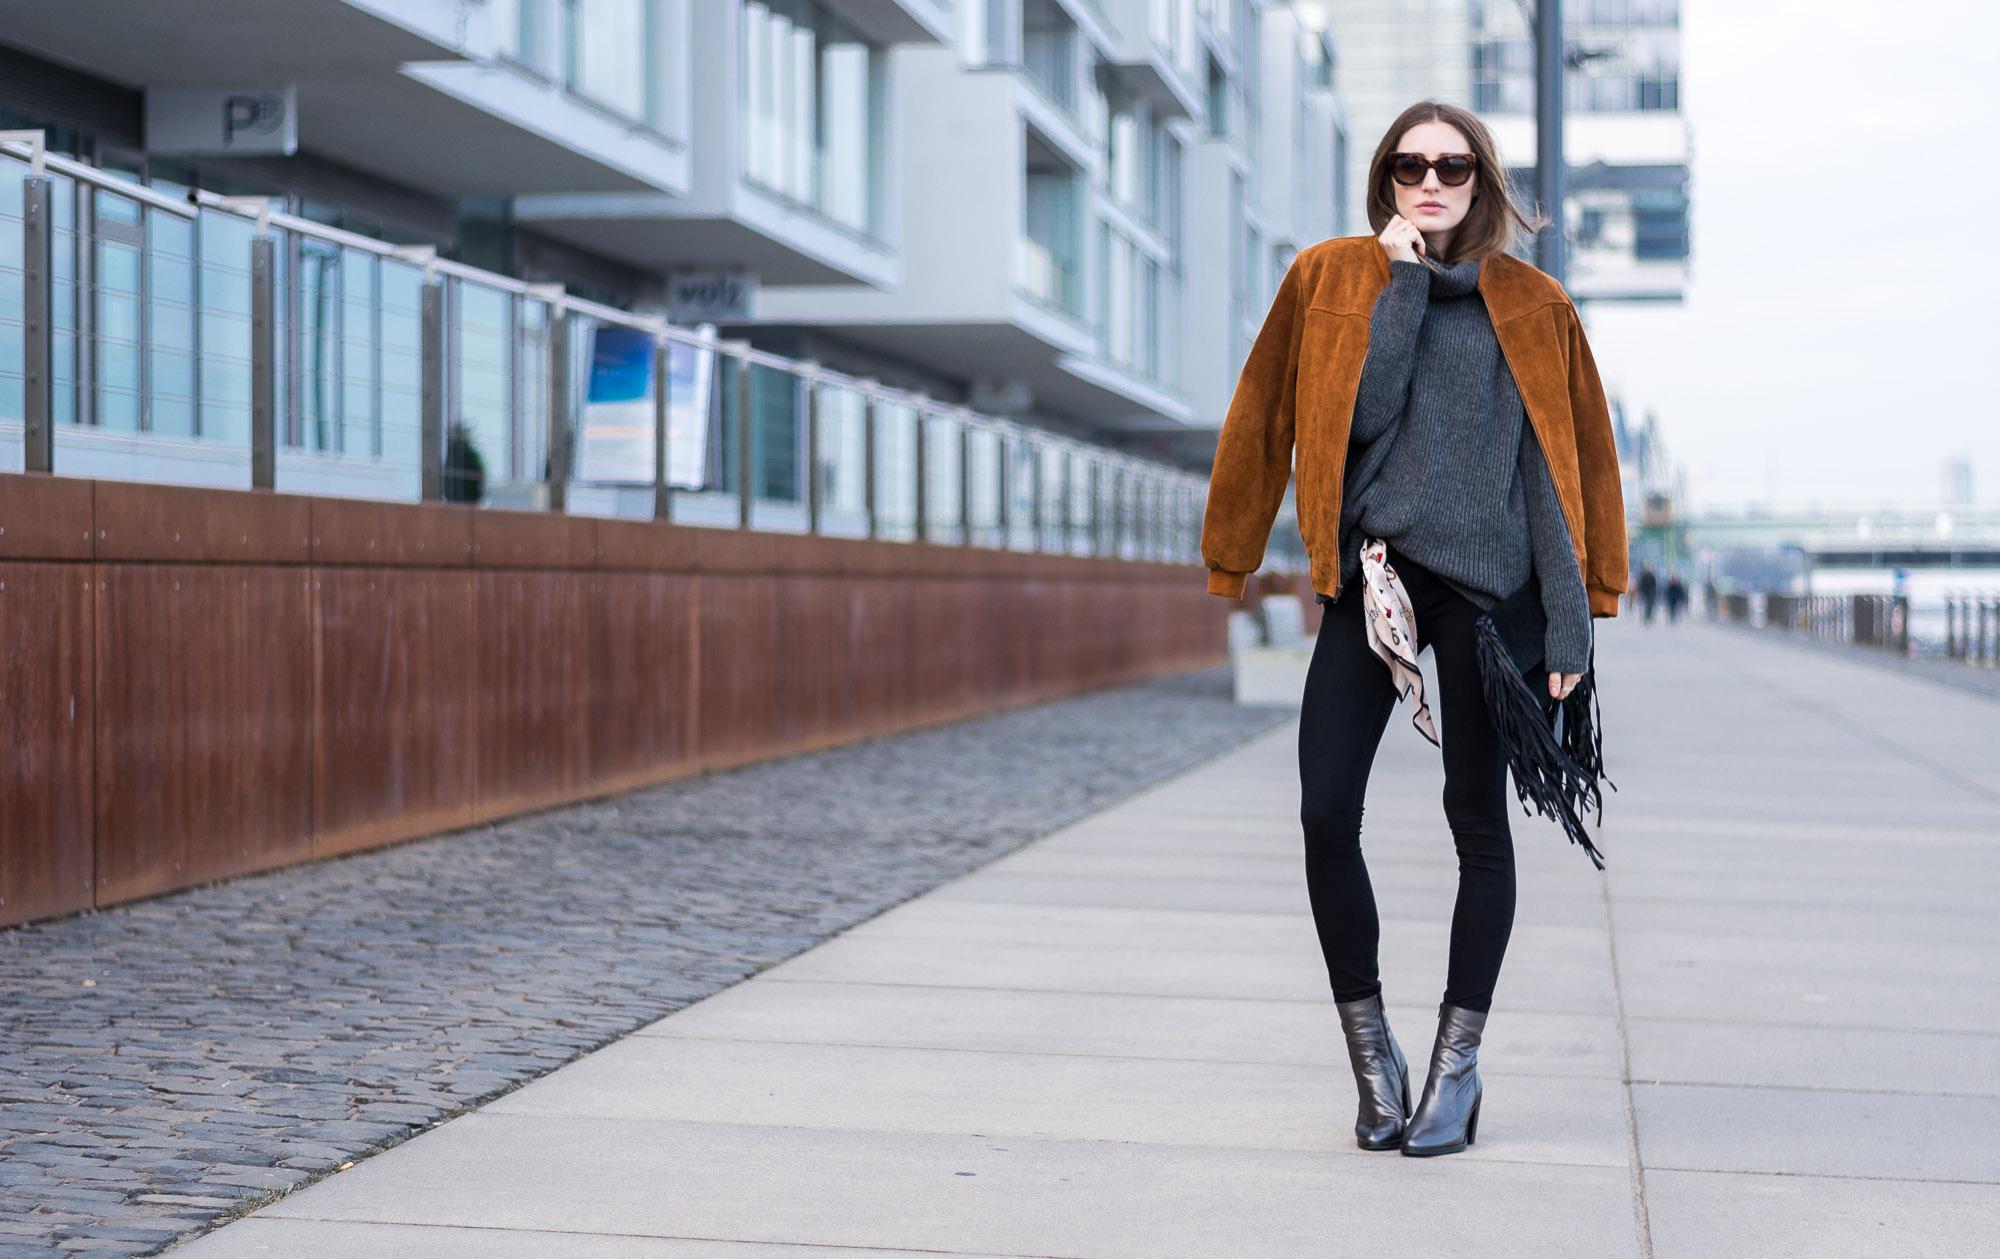 Streetstyle Urban Outfitters & Buffalo | Lisa Fiege